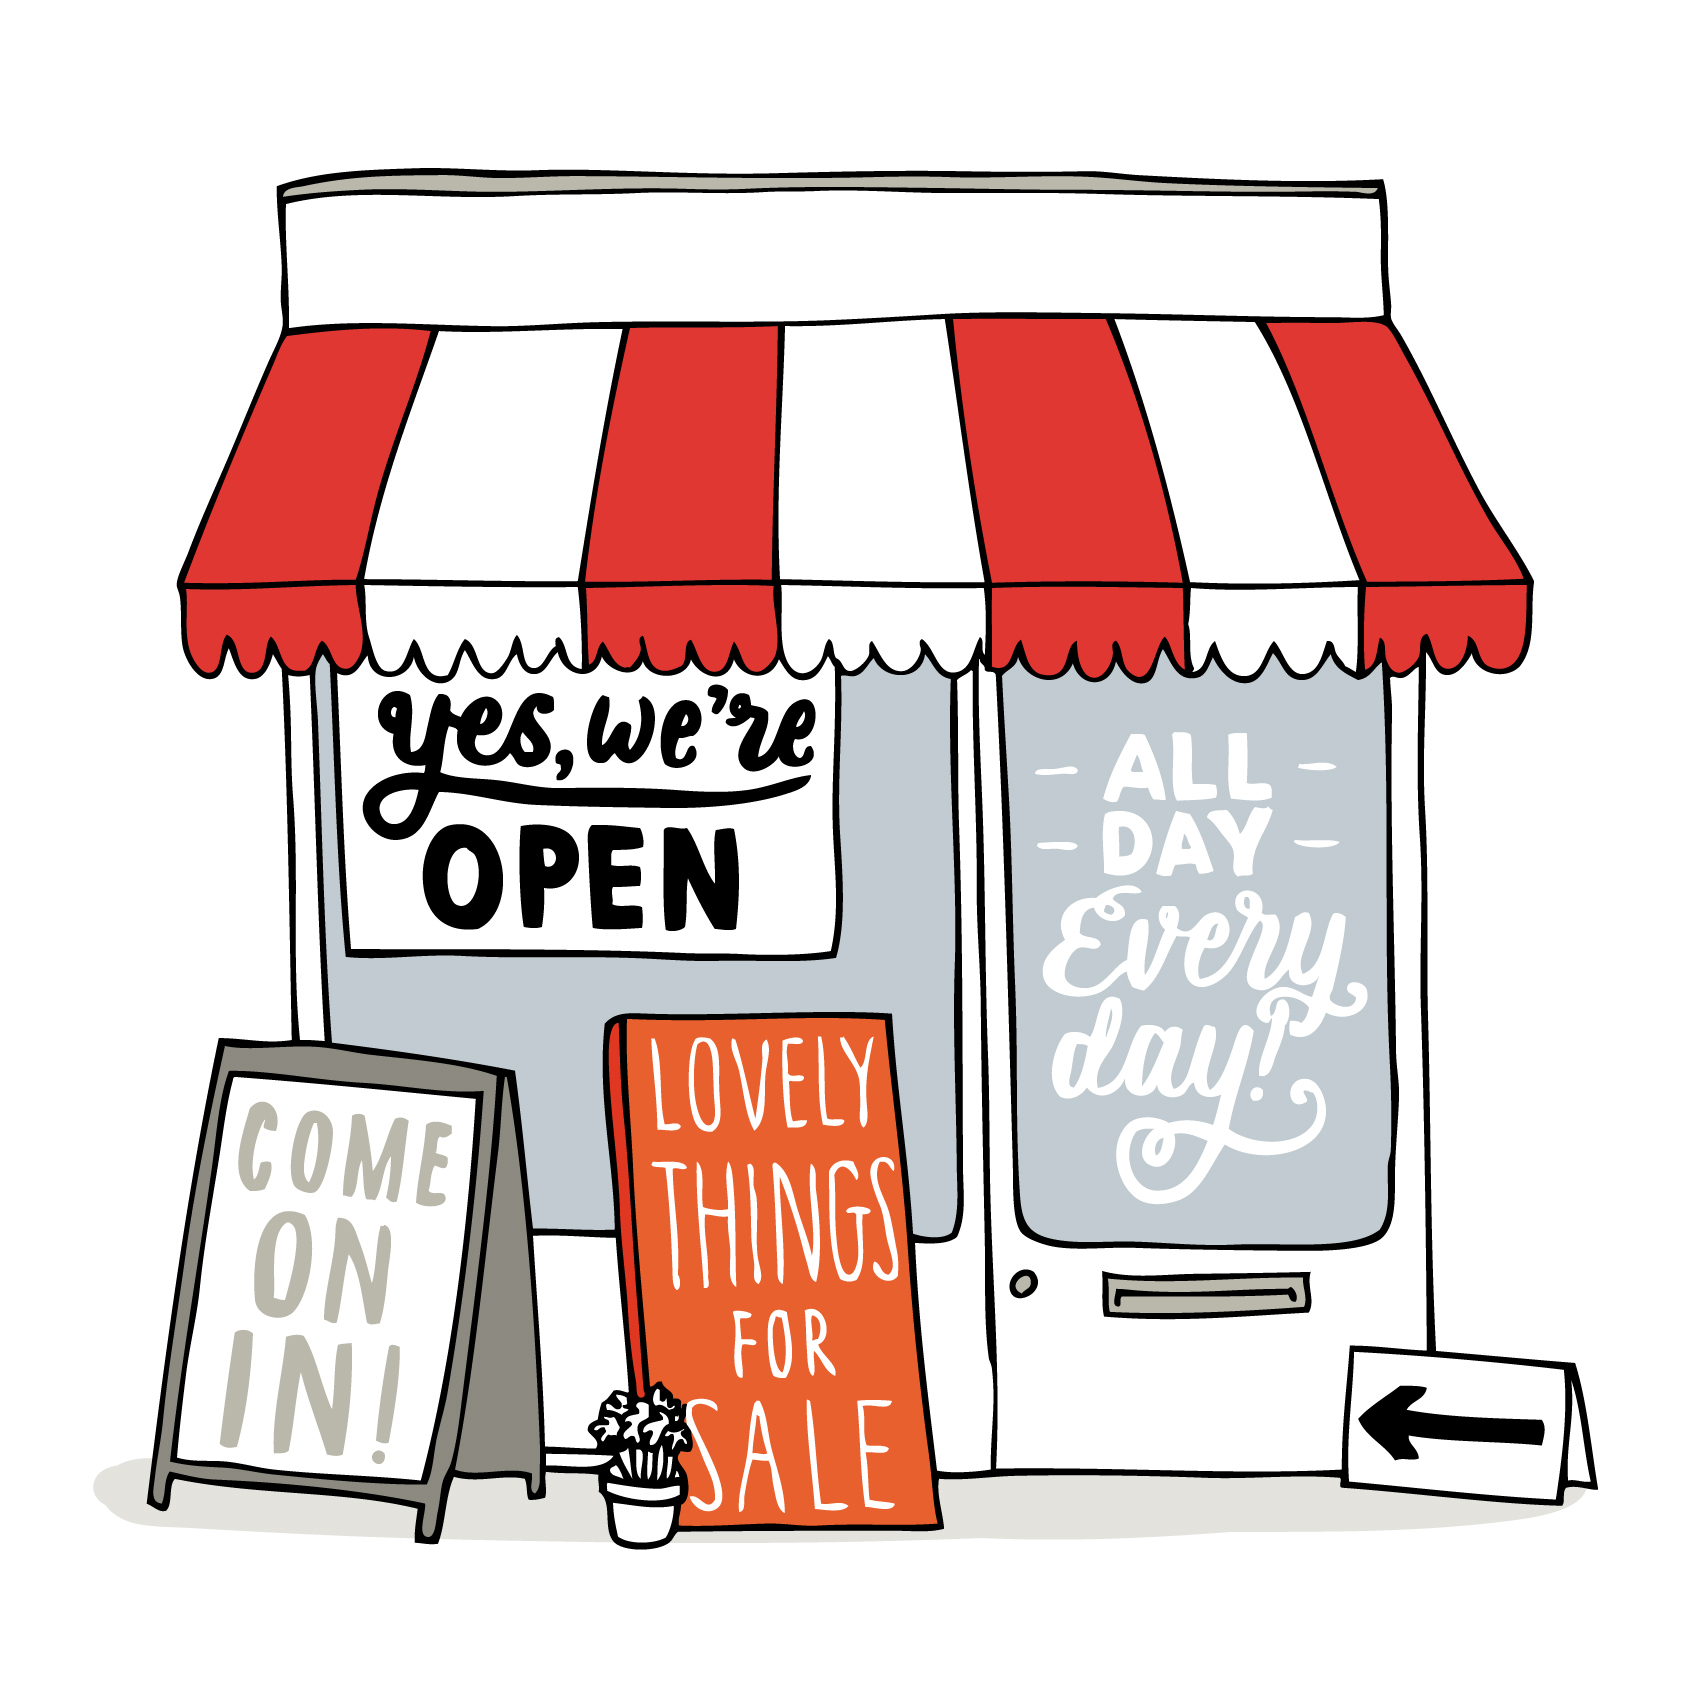 Lib Dem Call for Community Shop Cash – Howard Sykes: howardsykes.mycouncillor.org.uk/2015/04/09/lib-dem-call-for...